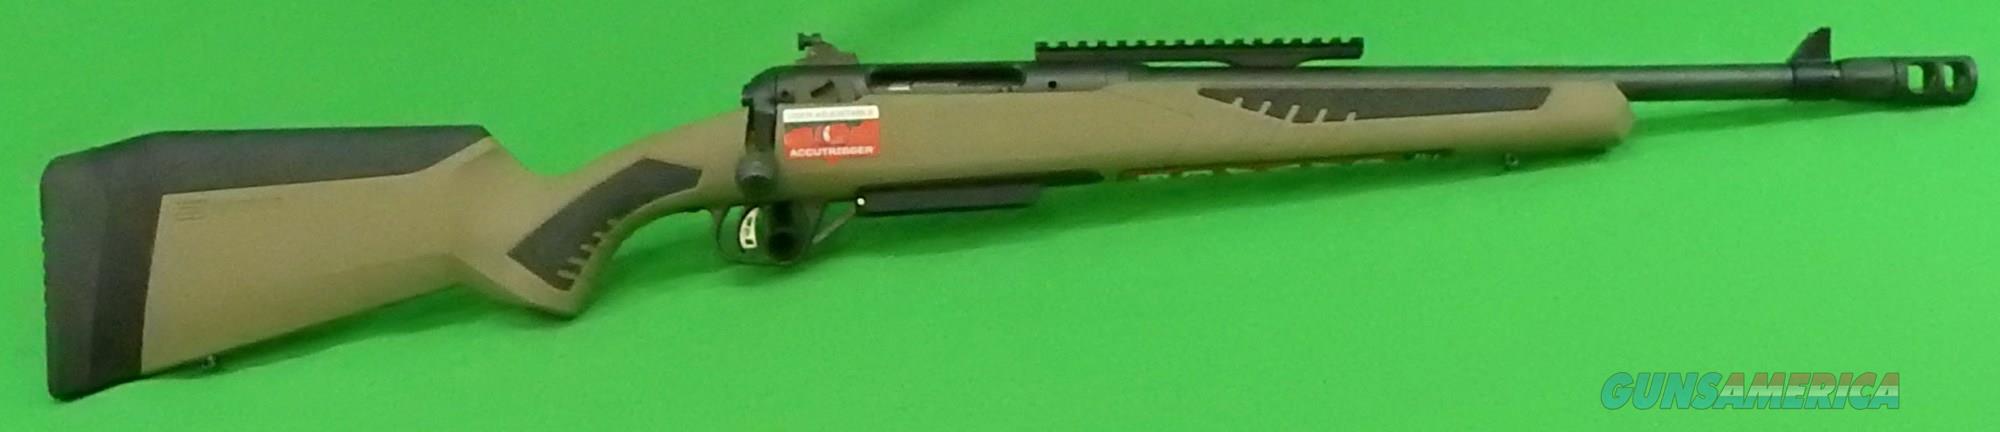 110 Scout FDE 308Win 18In  57026  Guns > Rifles > Savage Rifles > 10/110